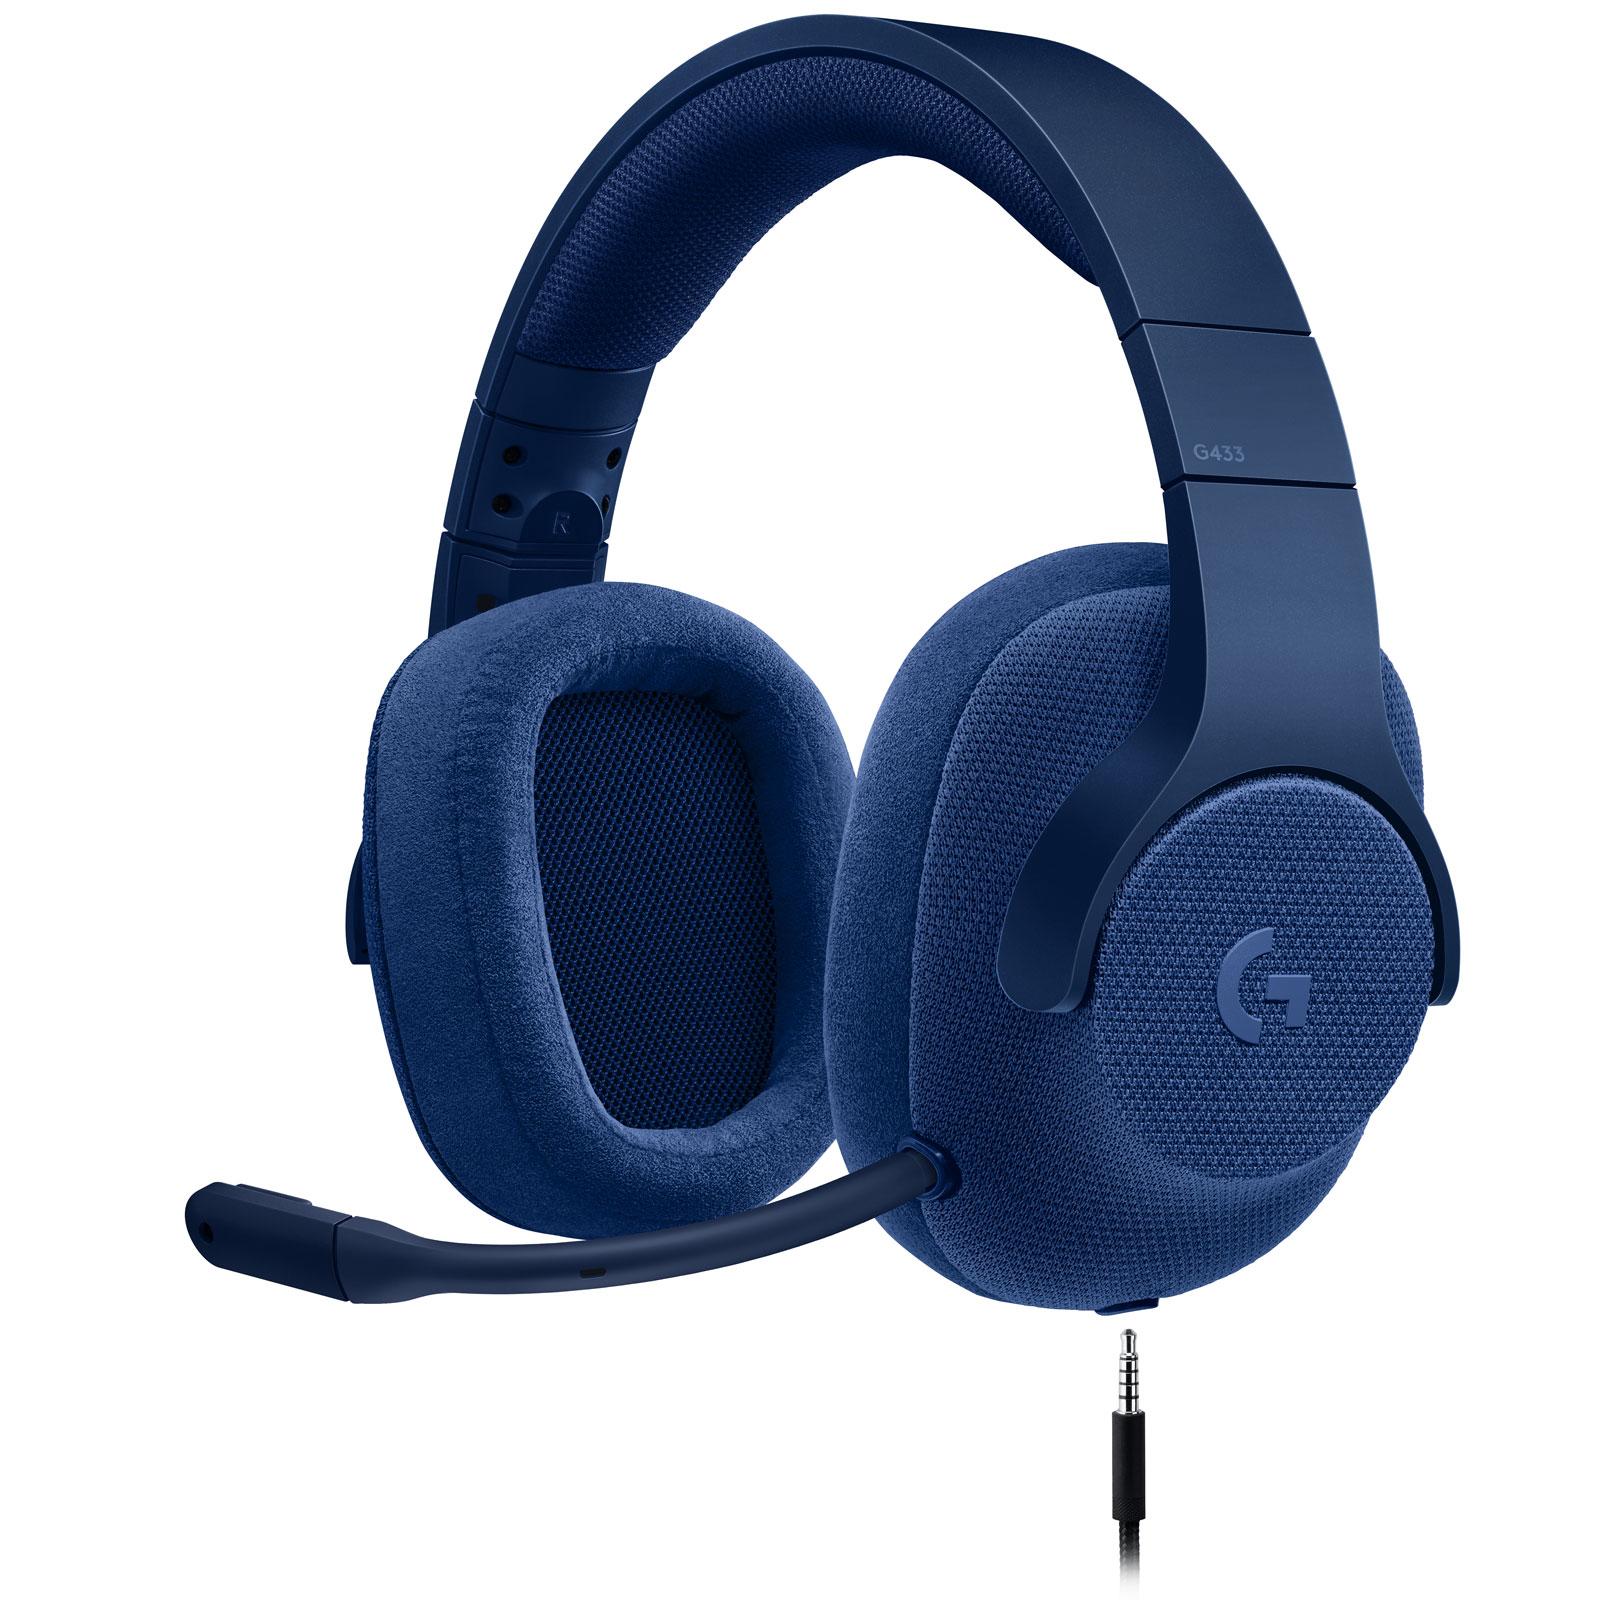 logitech g433 7 1 surround sound wired gaming headset bleu. Black Bedroom Furniture Sets. Home Design Ideas